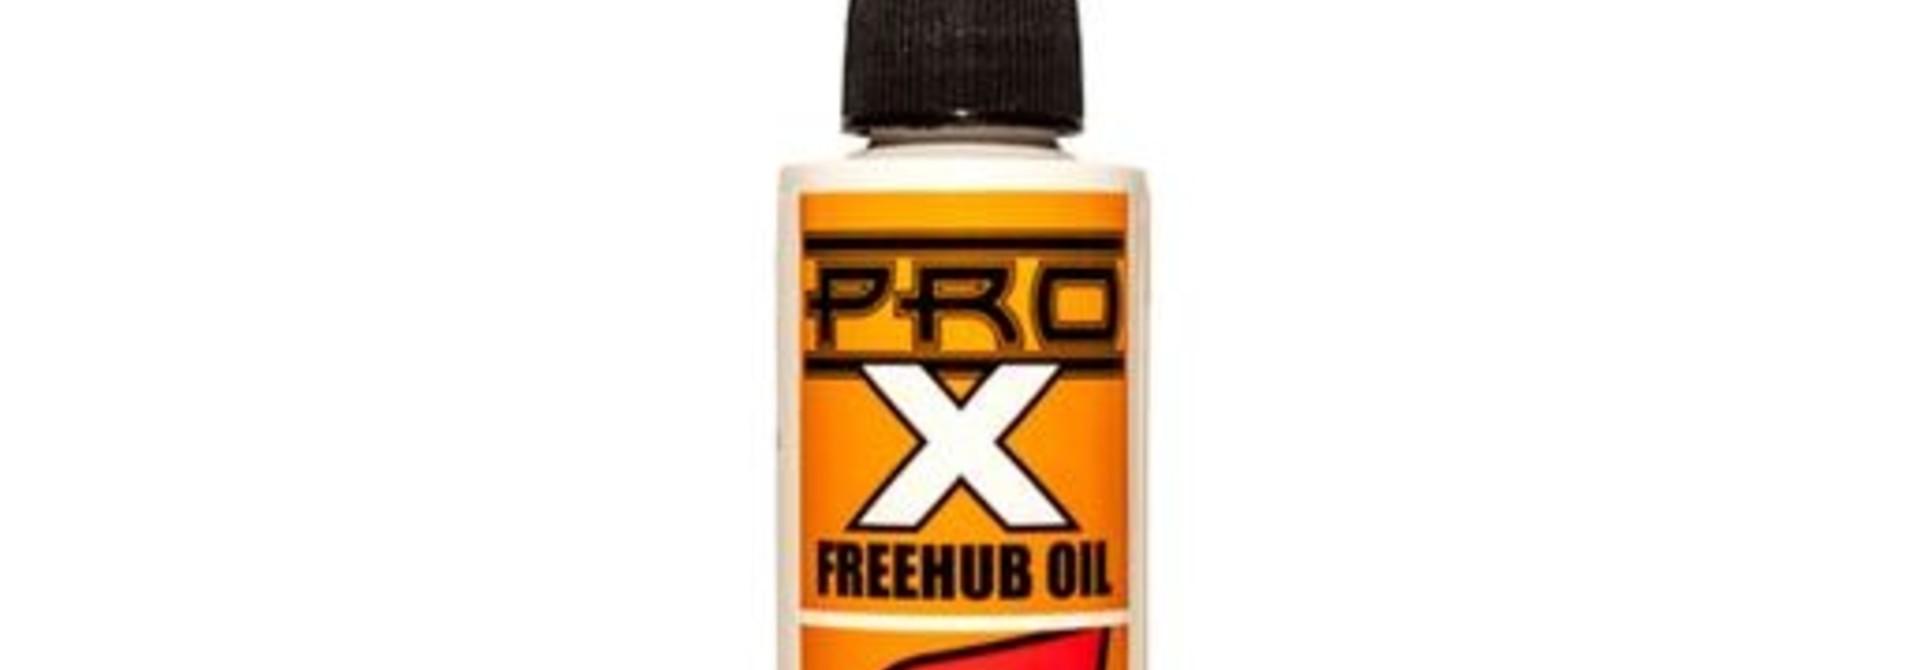 Dumonde Tech Pro X Freehub Oil 2oz Bottle (60mL)